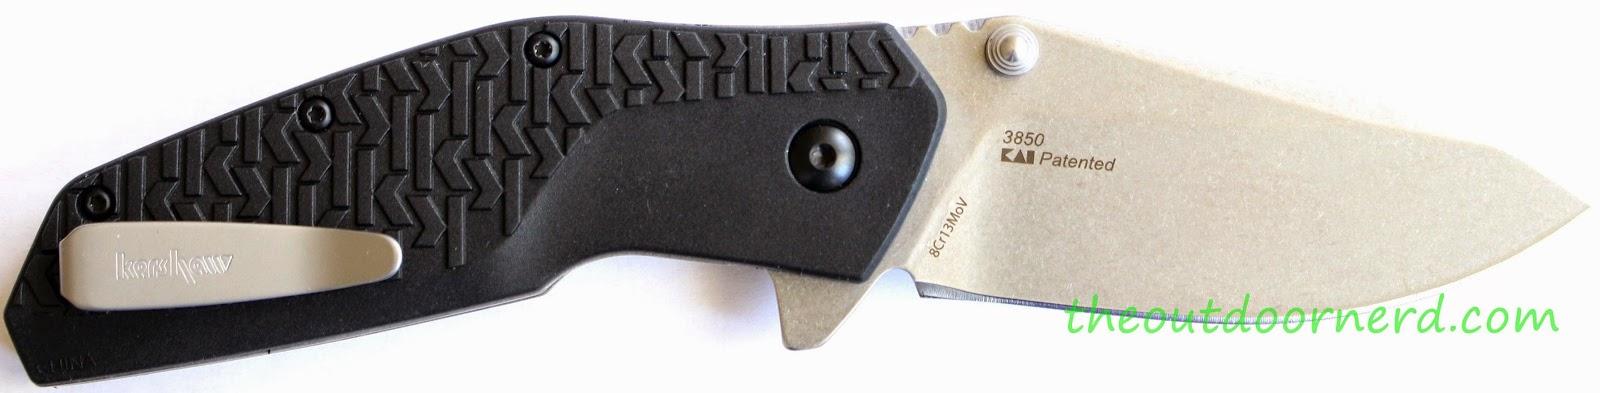 Kershaw Swerve EDC Pocket Knife: Product View 4